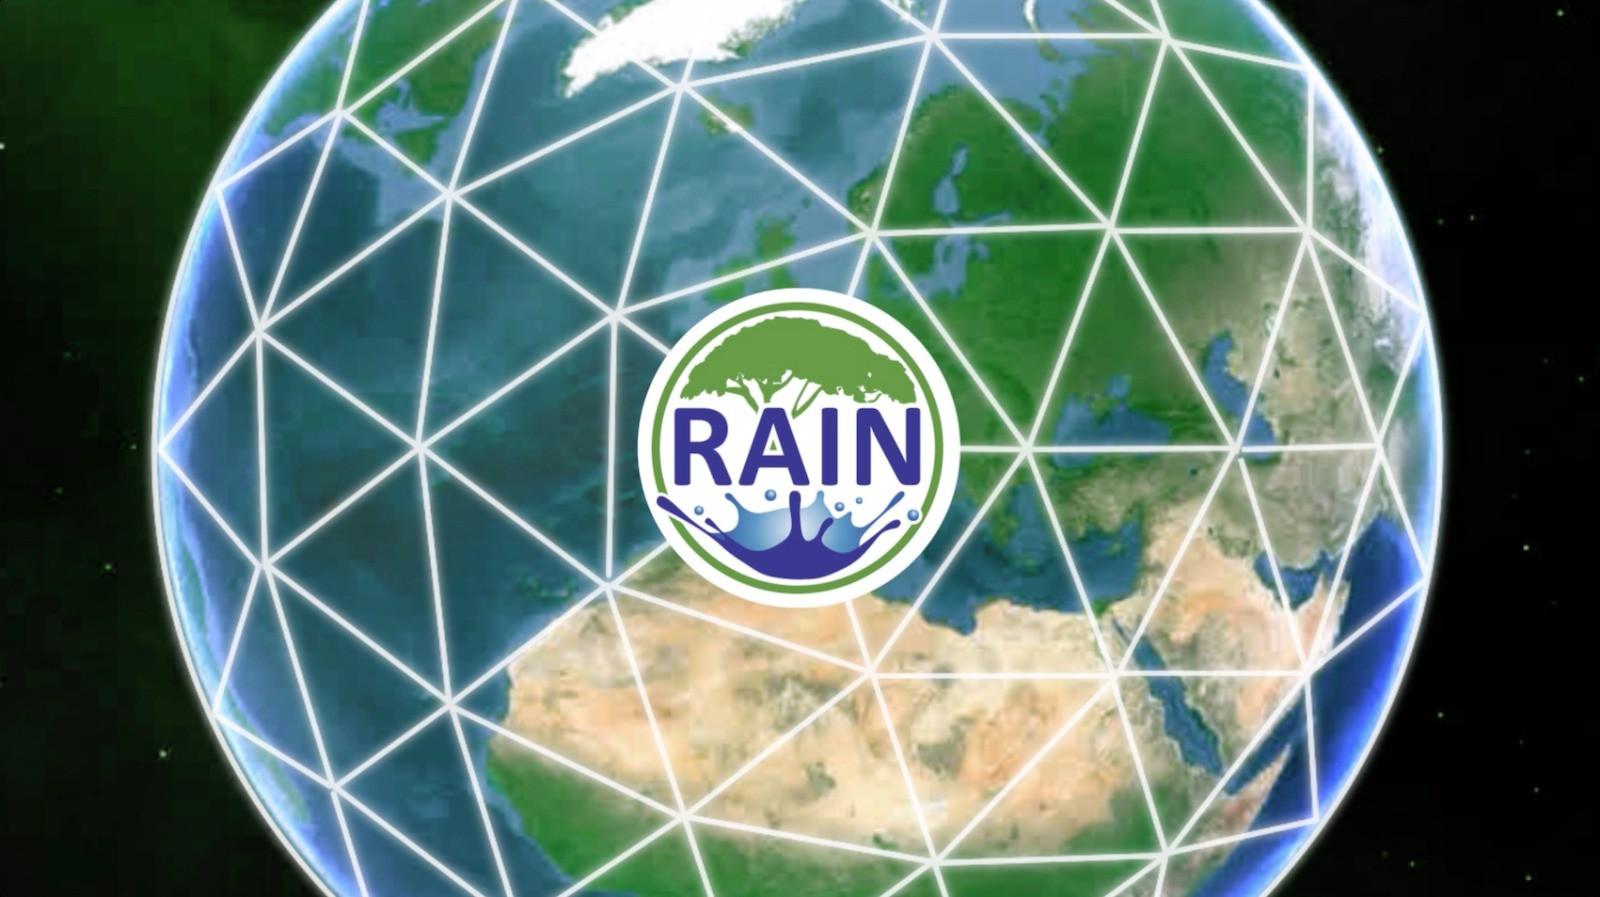 RAIN GEOMETRIC IMAGE.jpg